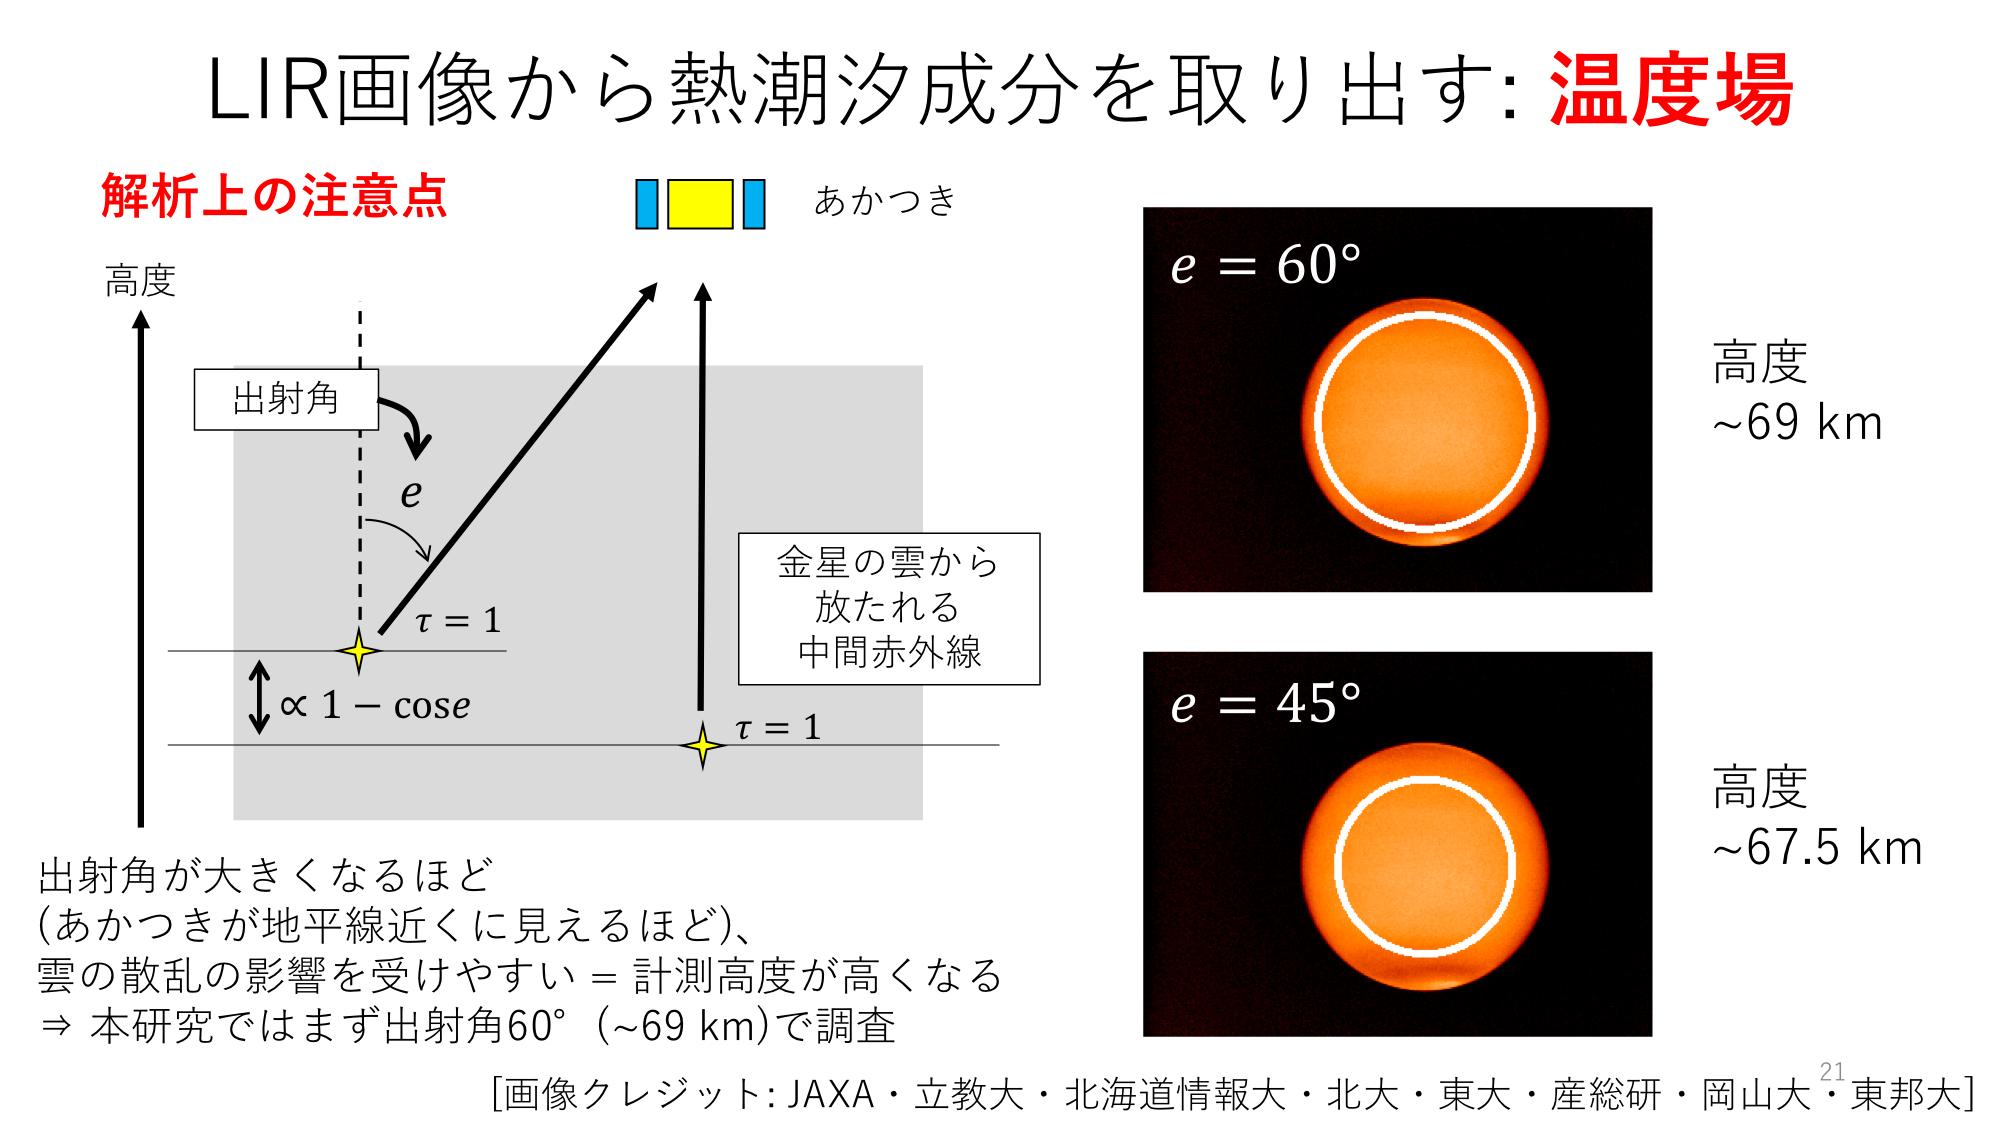 f:id:Imamura:20191119205545p:plain